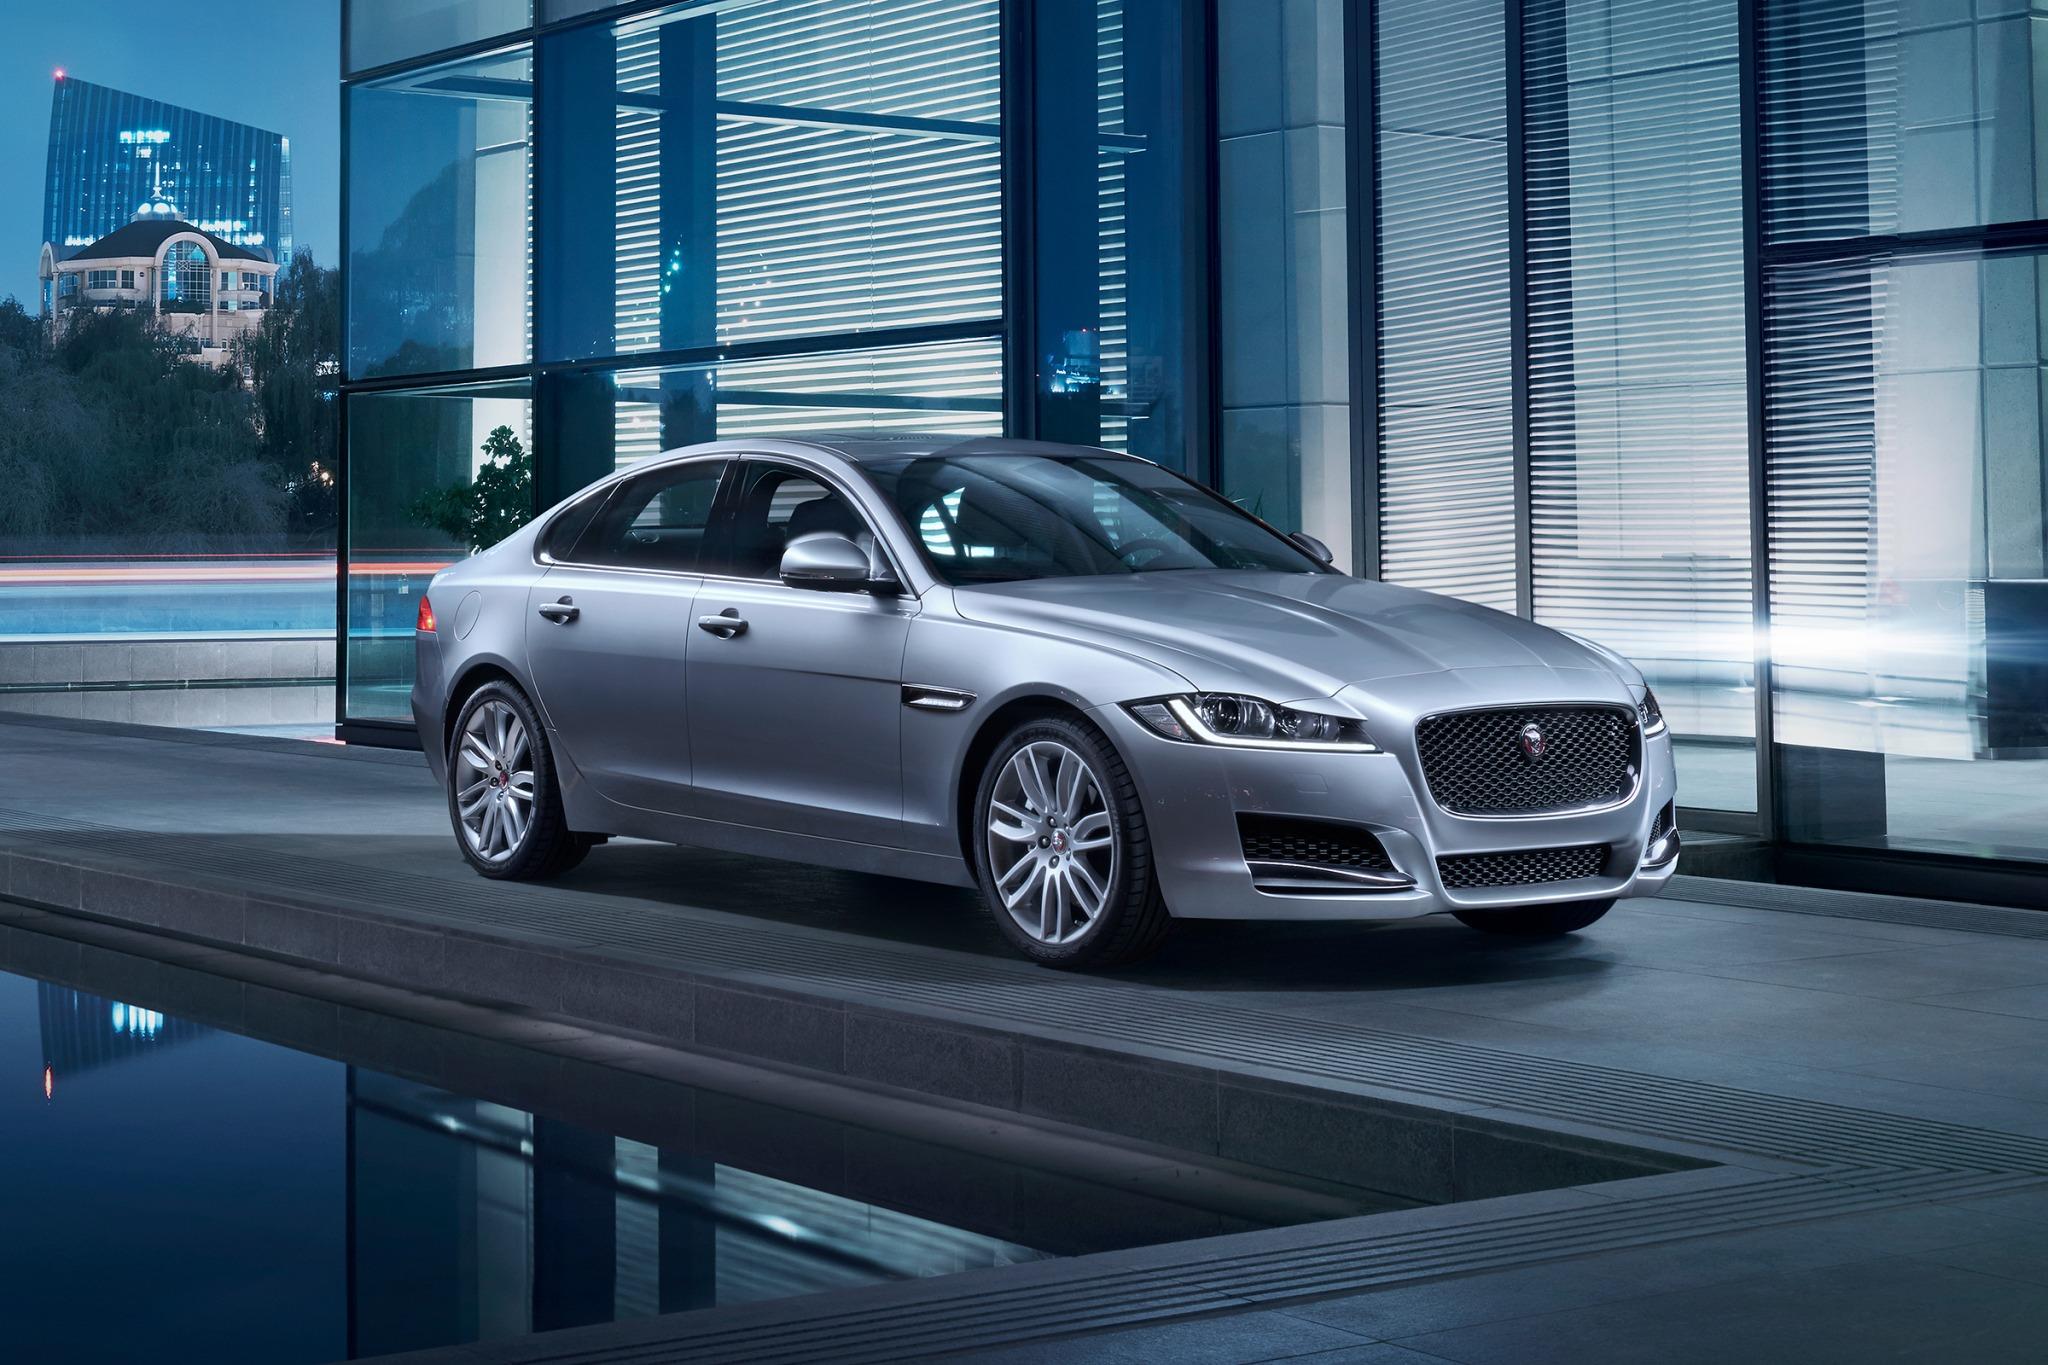 2018 jaguar xf sedan 35t prestige fq oem 1 2048